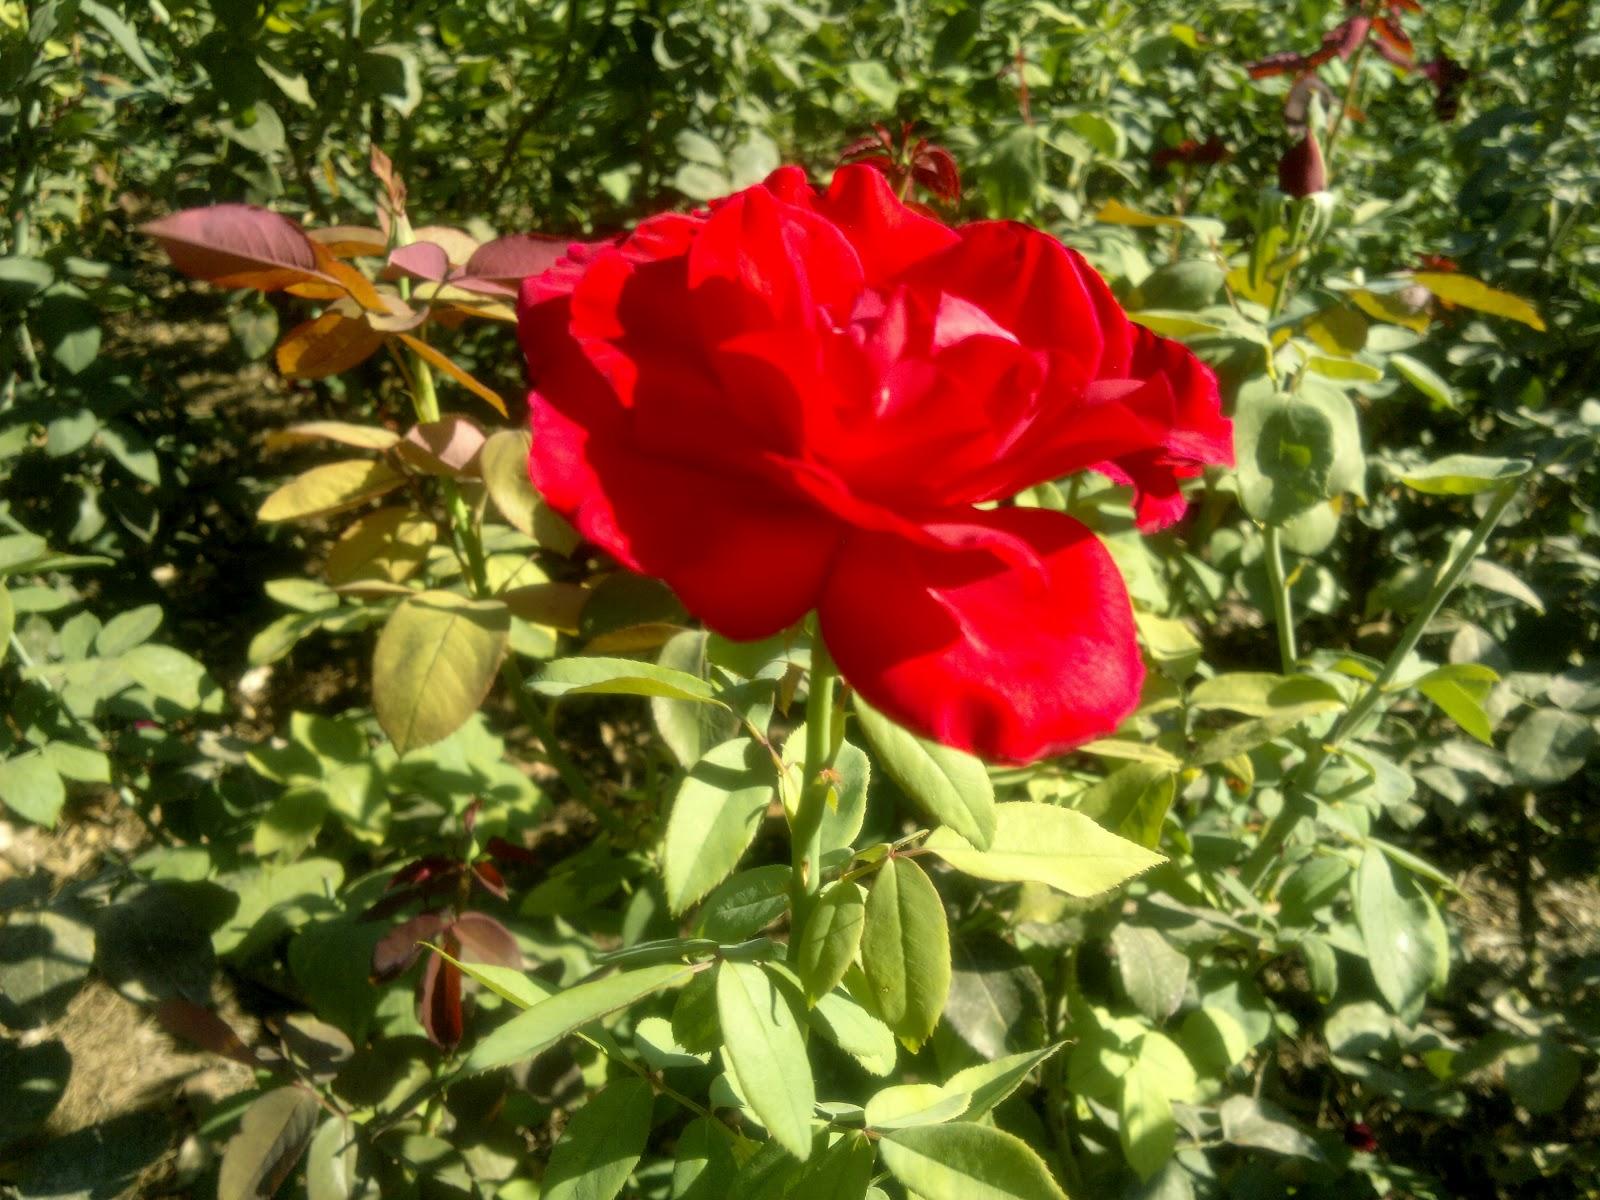 Crea tu jard n jard n de historias rom nticas monforte for Crea tu jardin